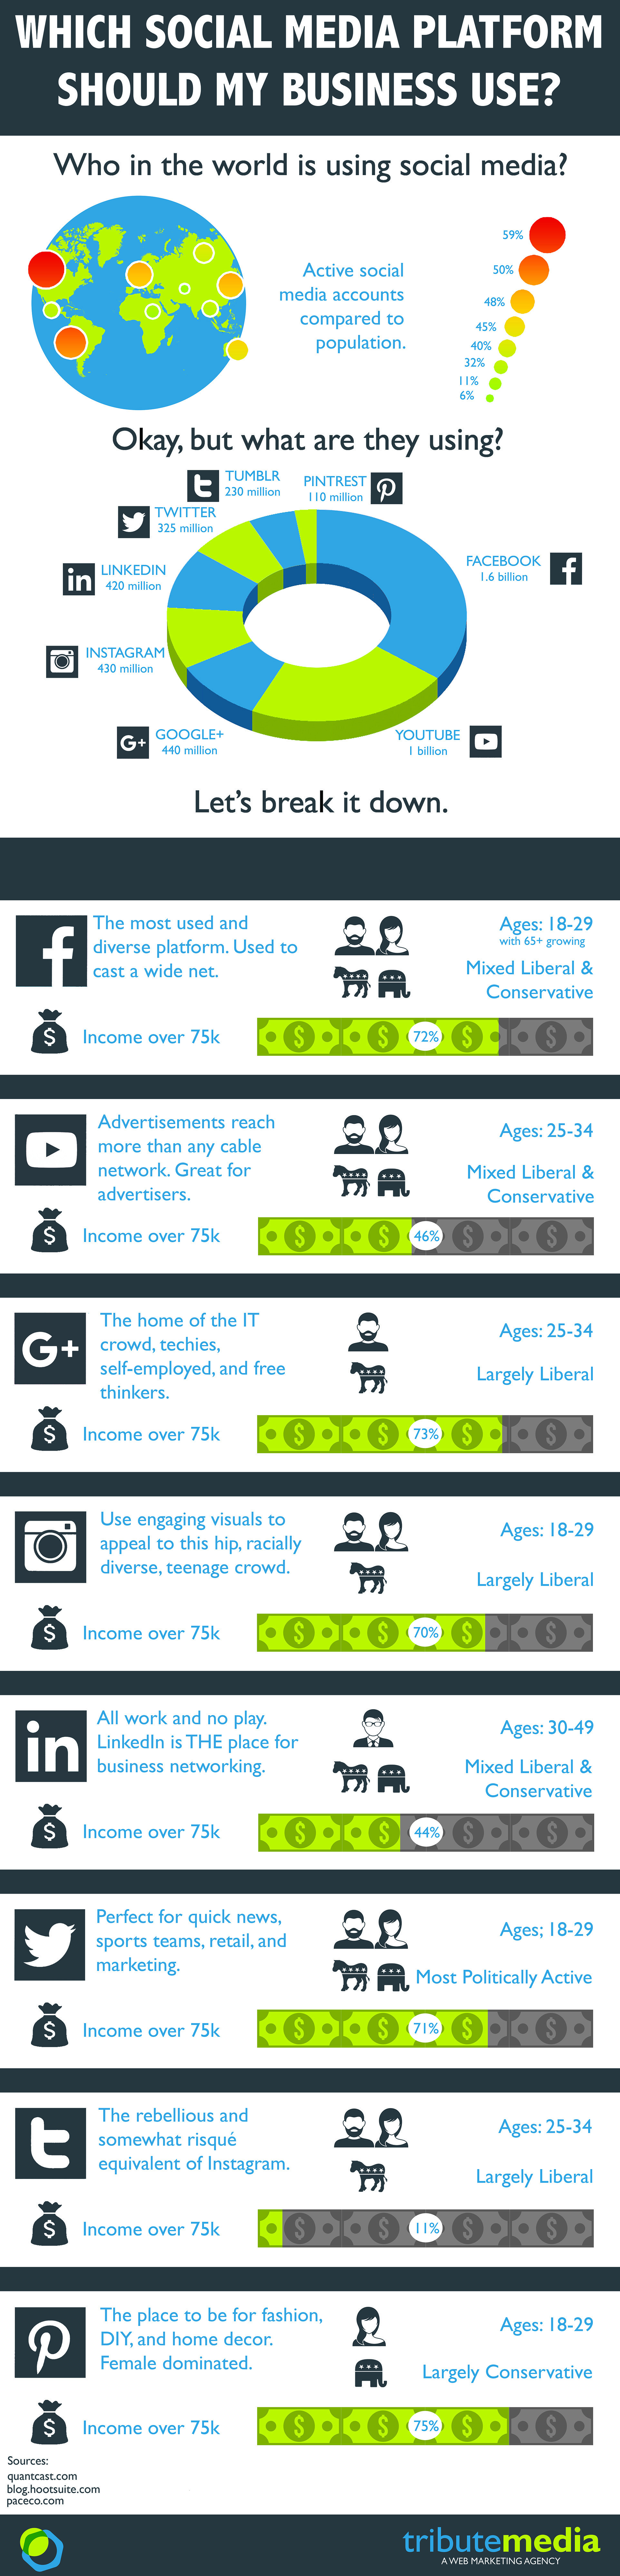 Social_Media_Infographic_Final2.jpg